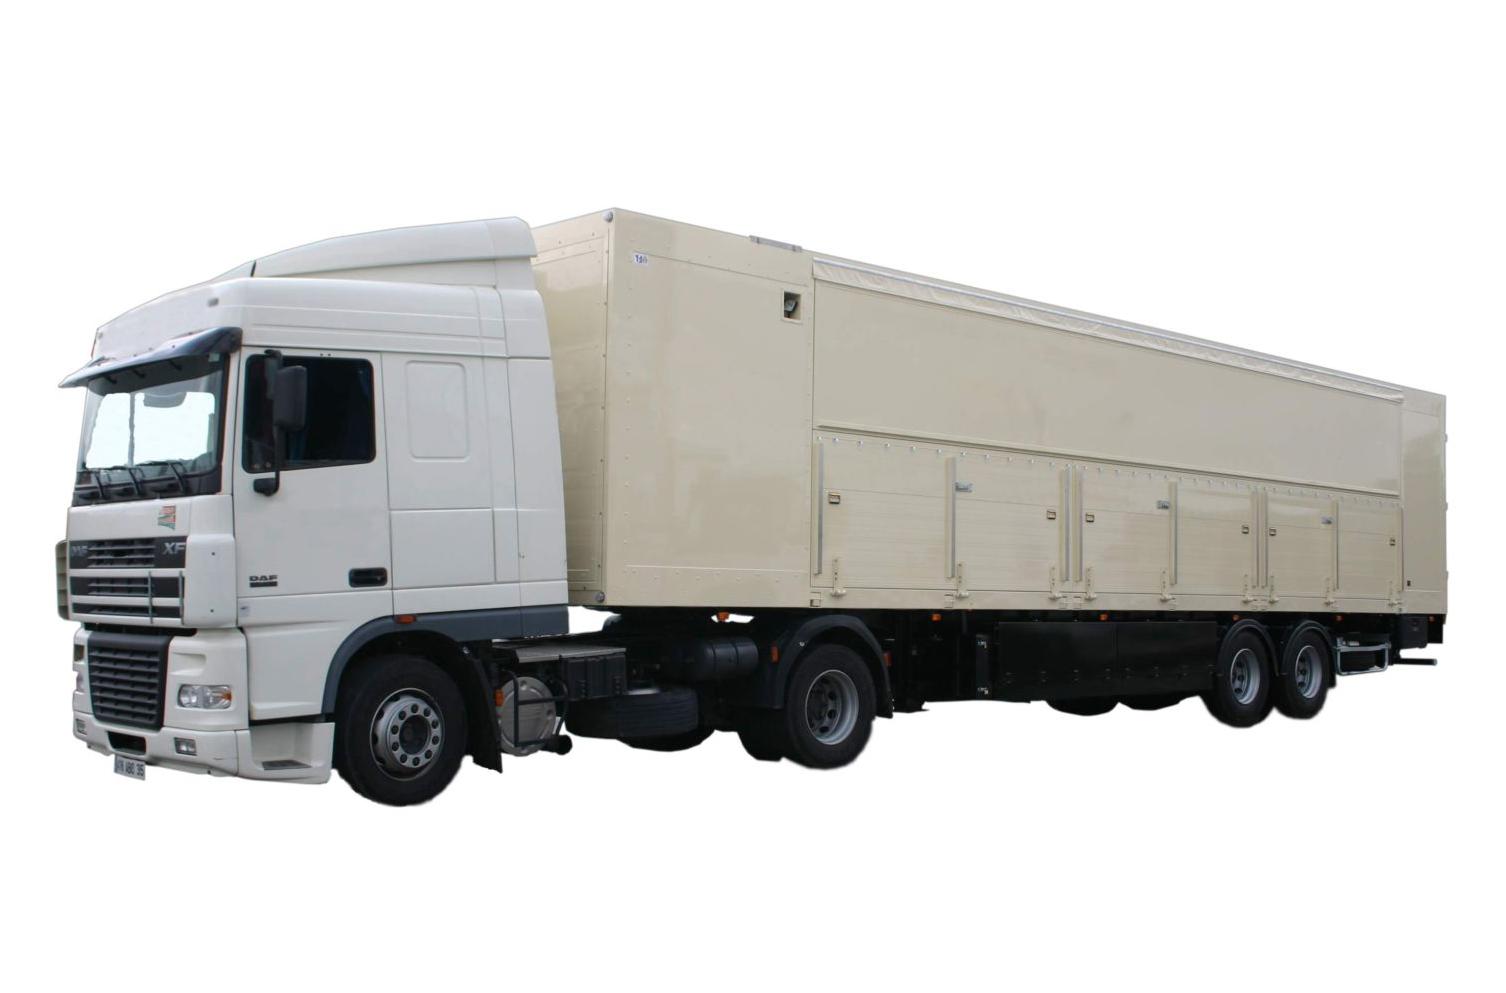 Trailer, Transport, Transportation, Truck Icon image #37600